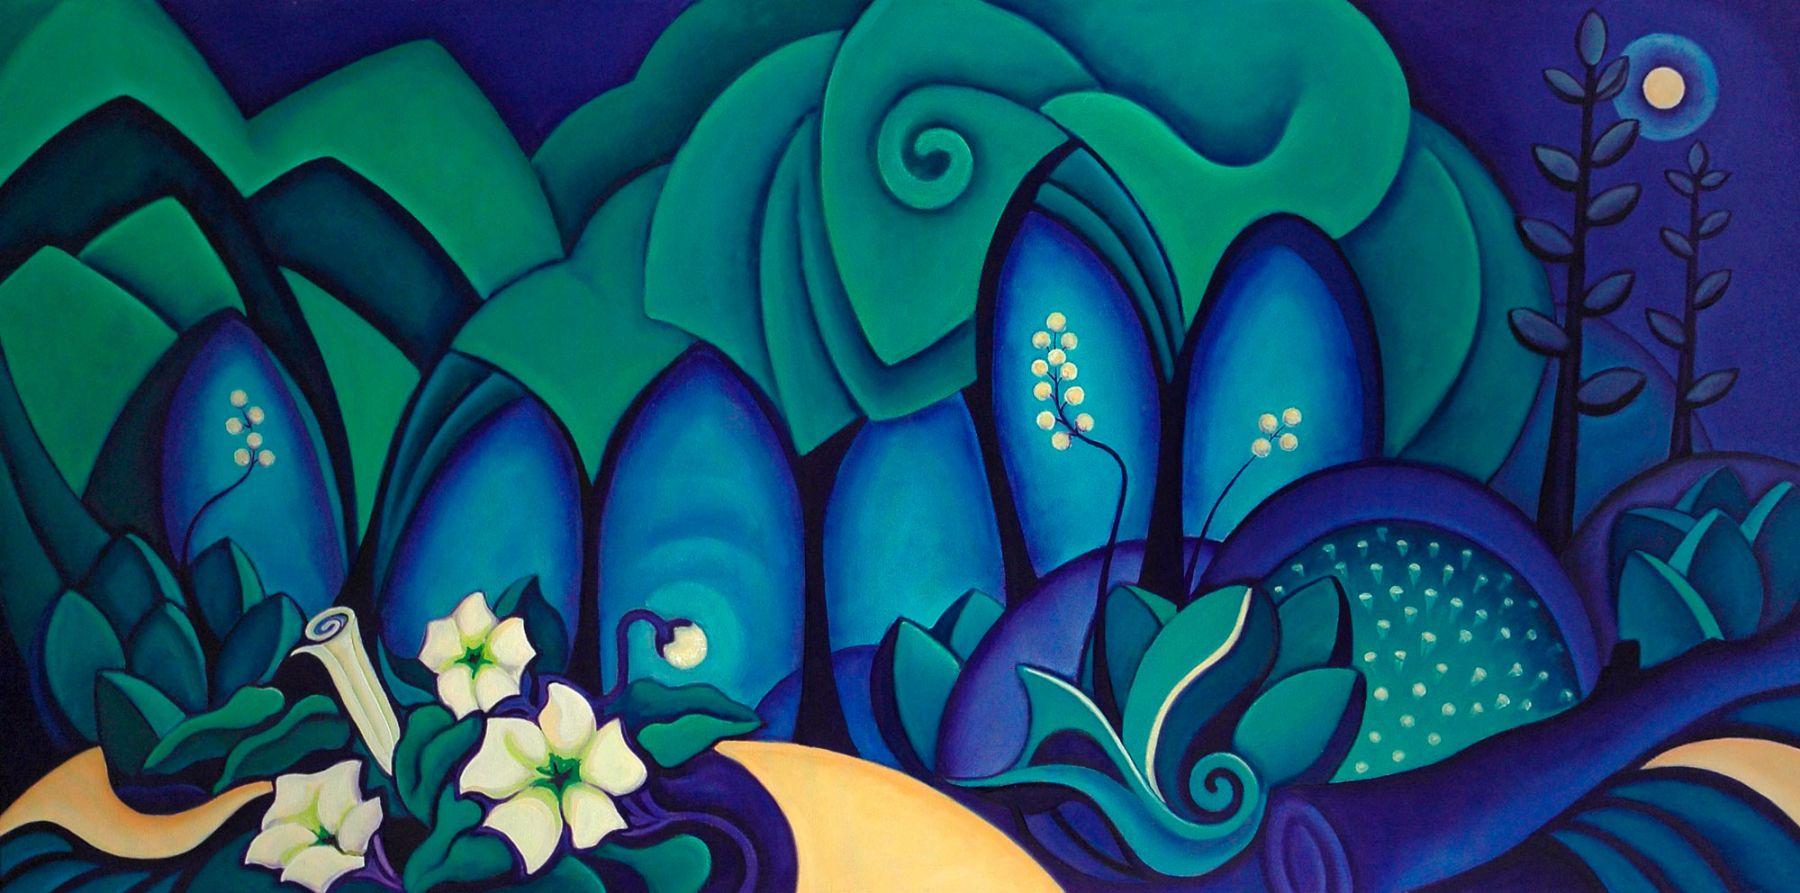 Angela Perko, Moonlit Path with Jimson Weeds, 2007